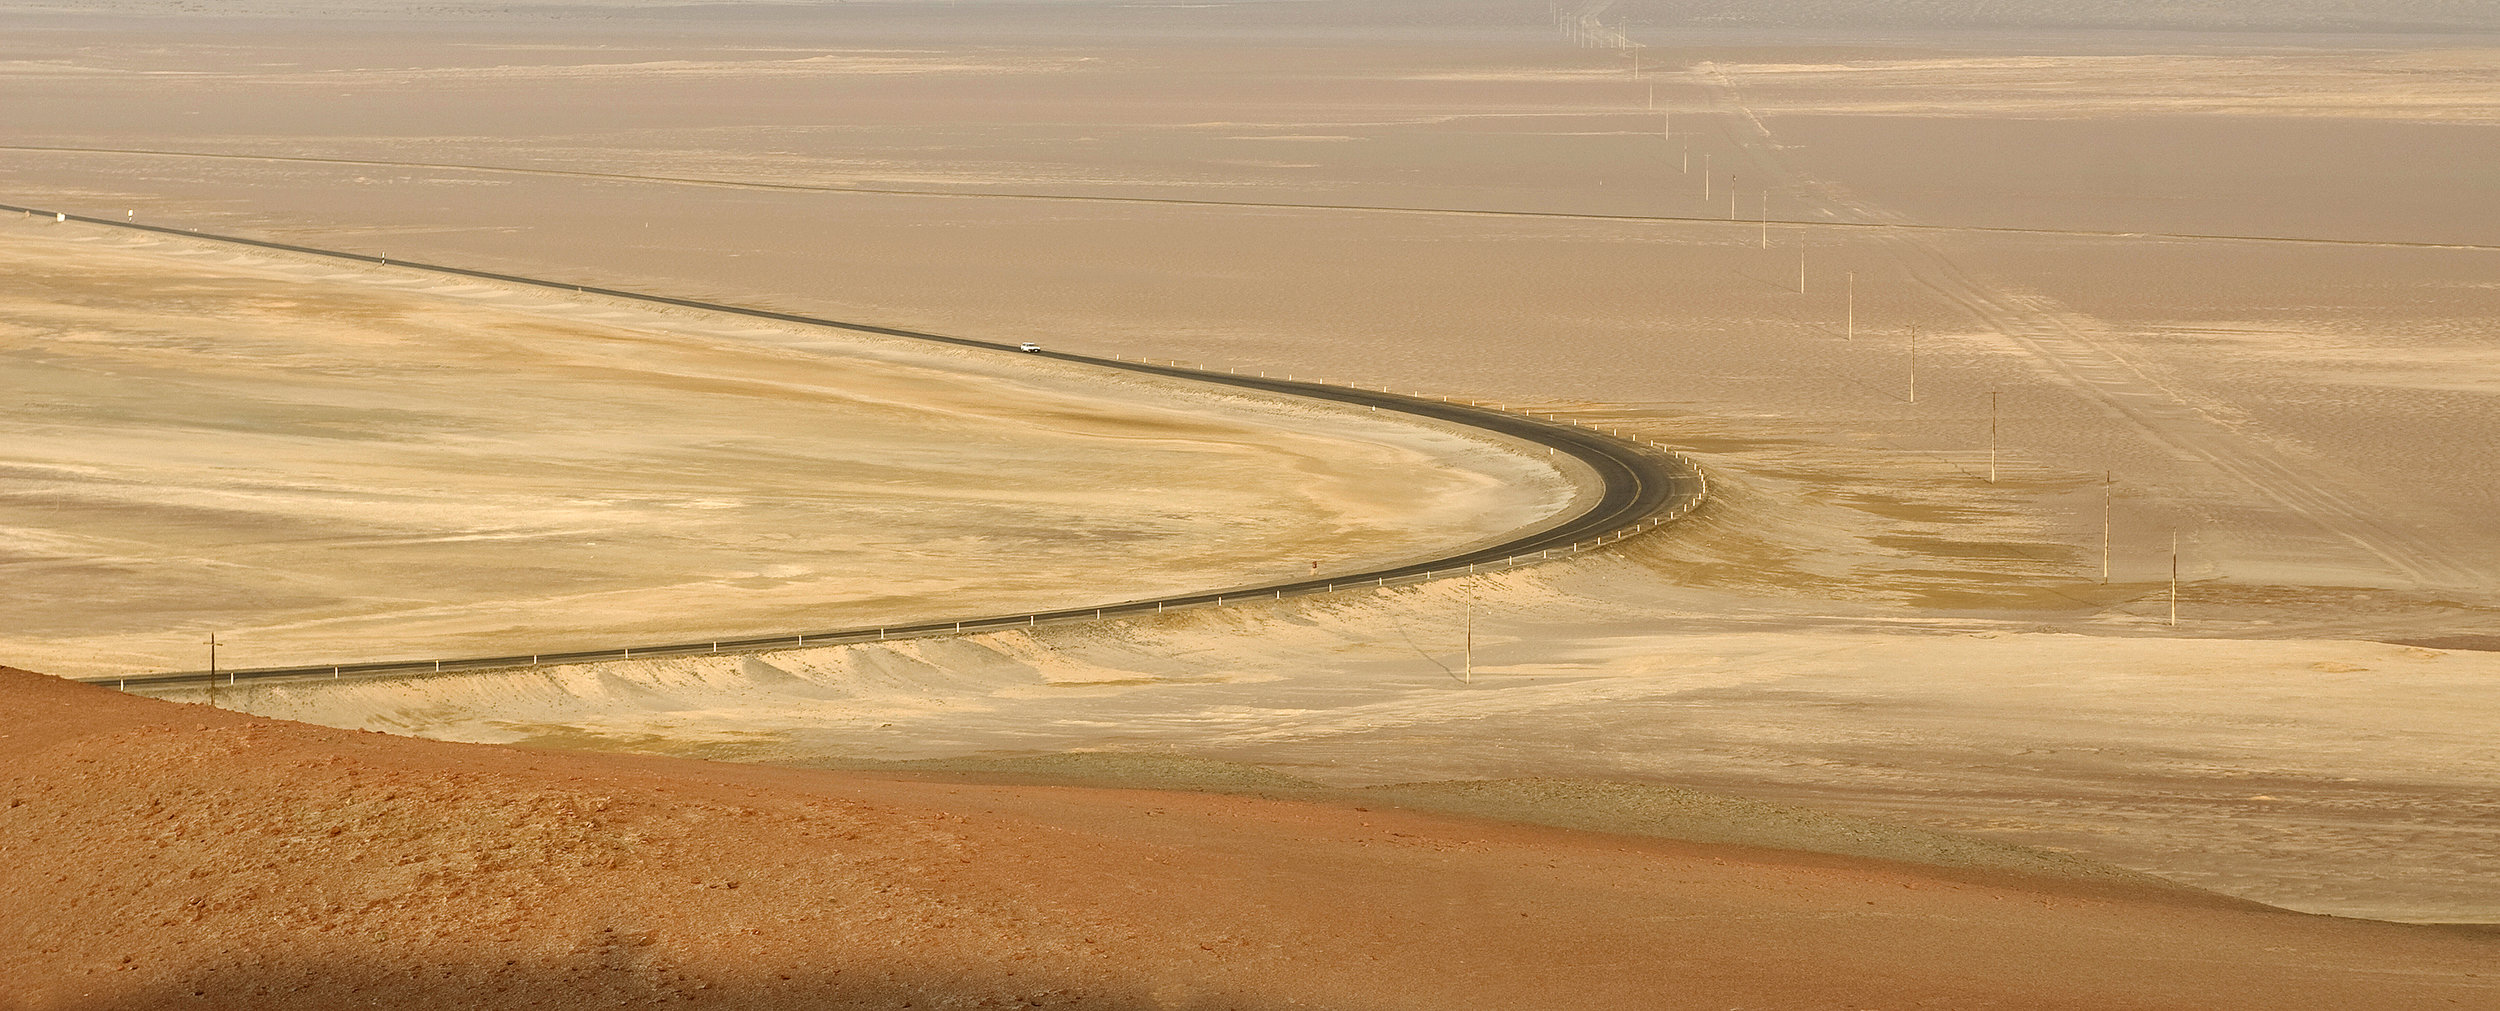 Dream Road Pérou